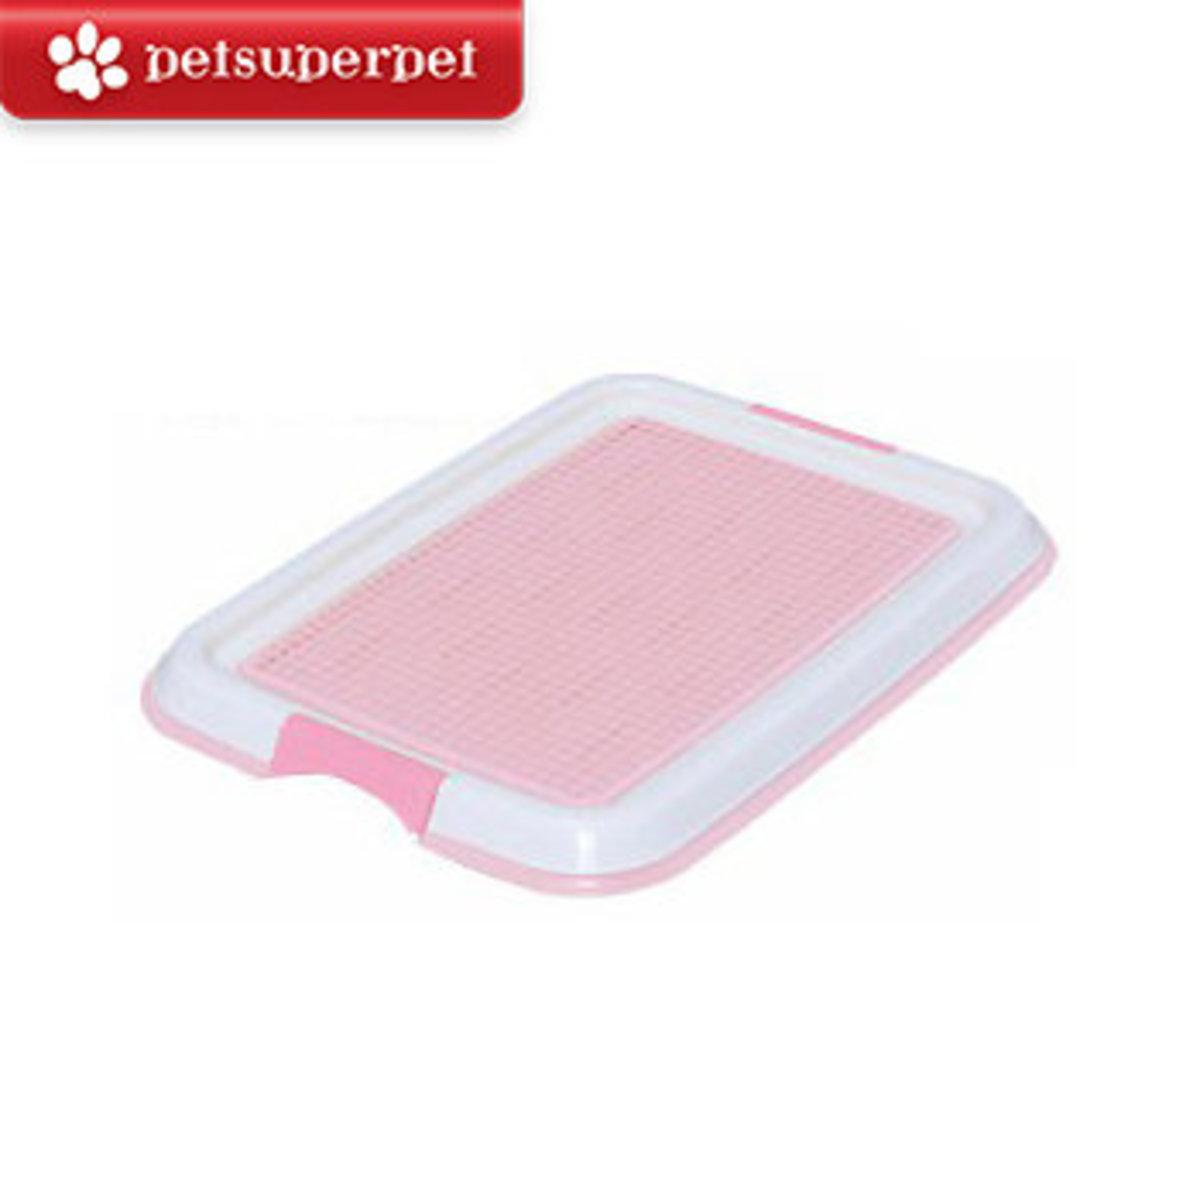 Japan TFT-650 Dog Toilet Board (Parallel Import Goods) - Pink (65x55cm)